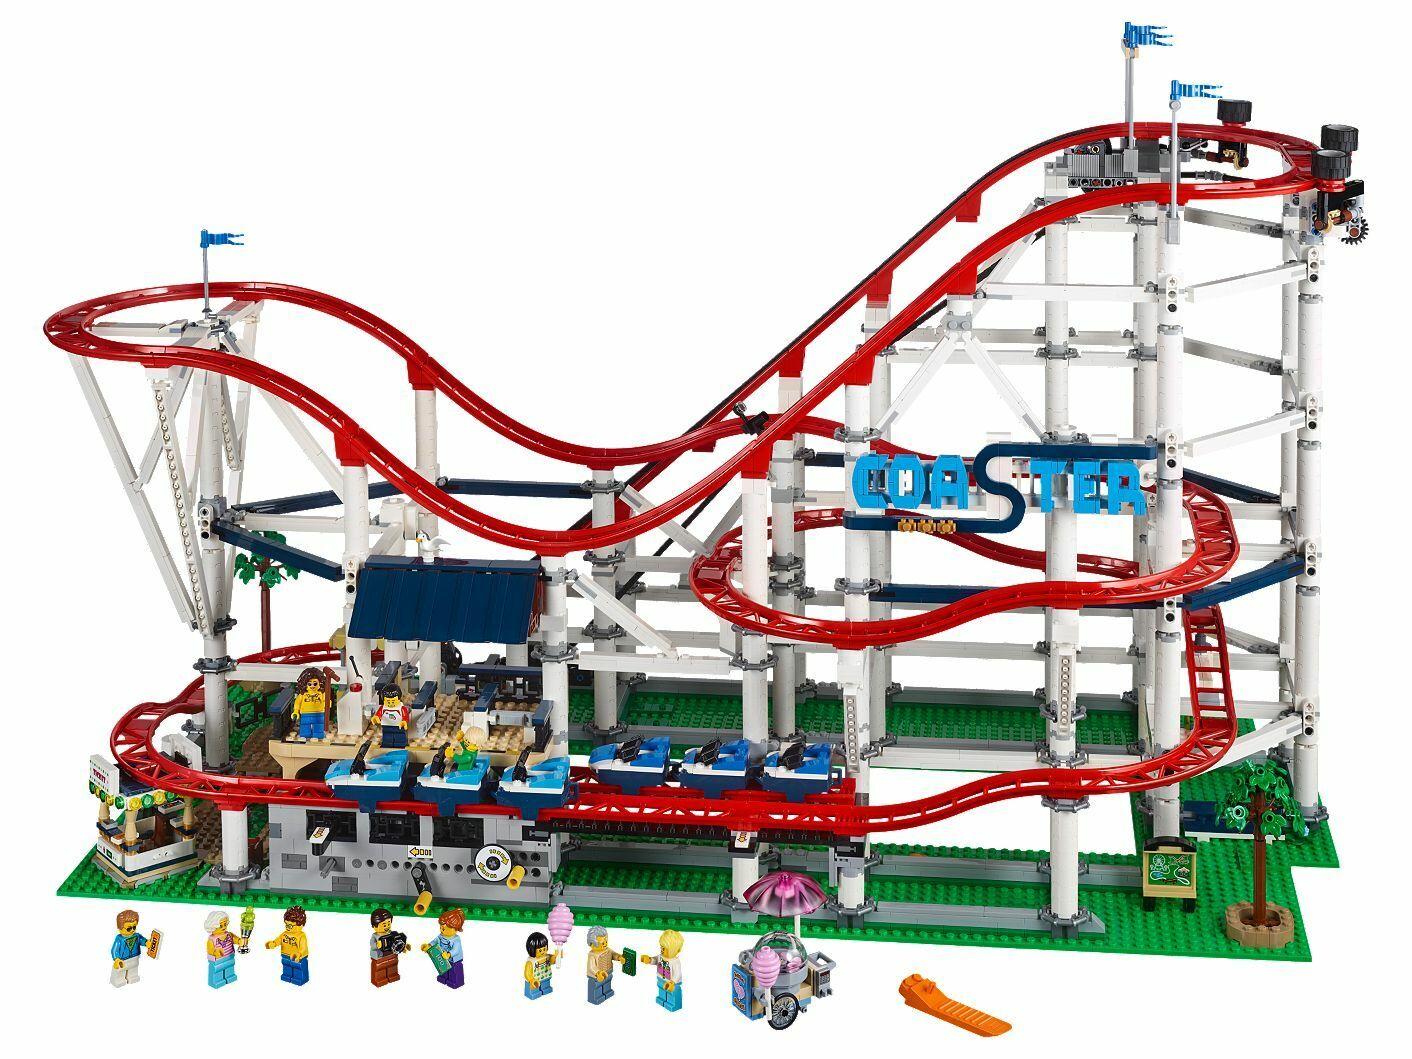 Nouveau Lego Creator Expert Roller  Coaster Set 10261  4000+ pieces BO  derniers styles